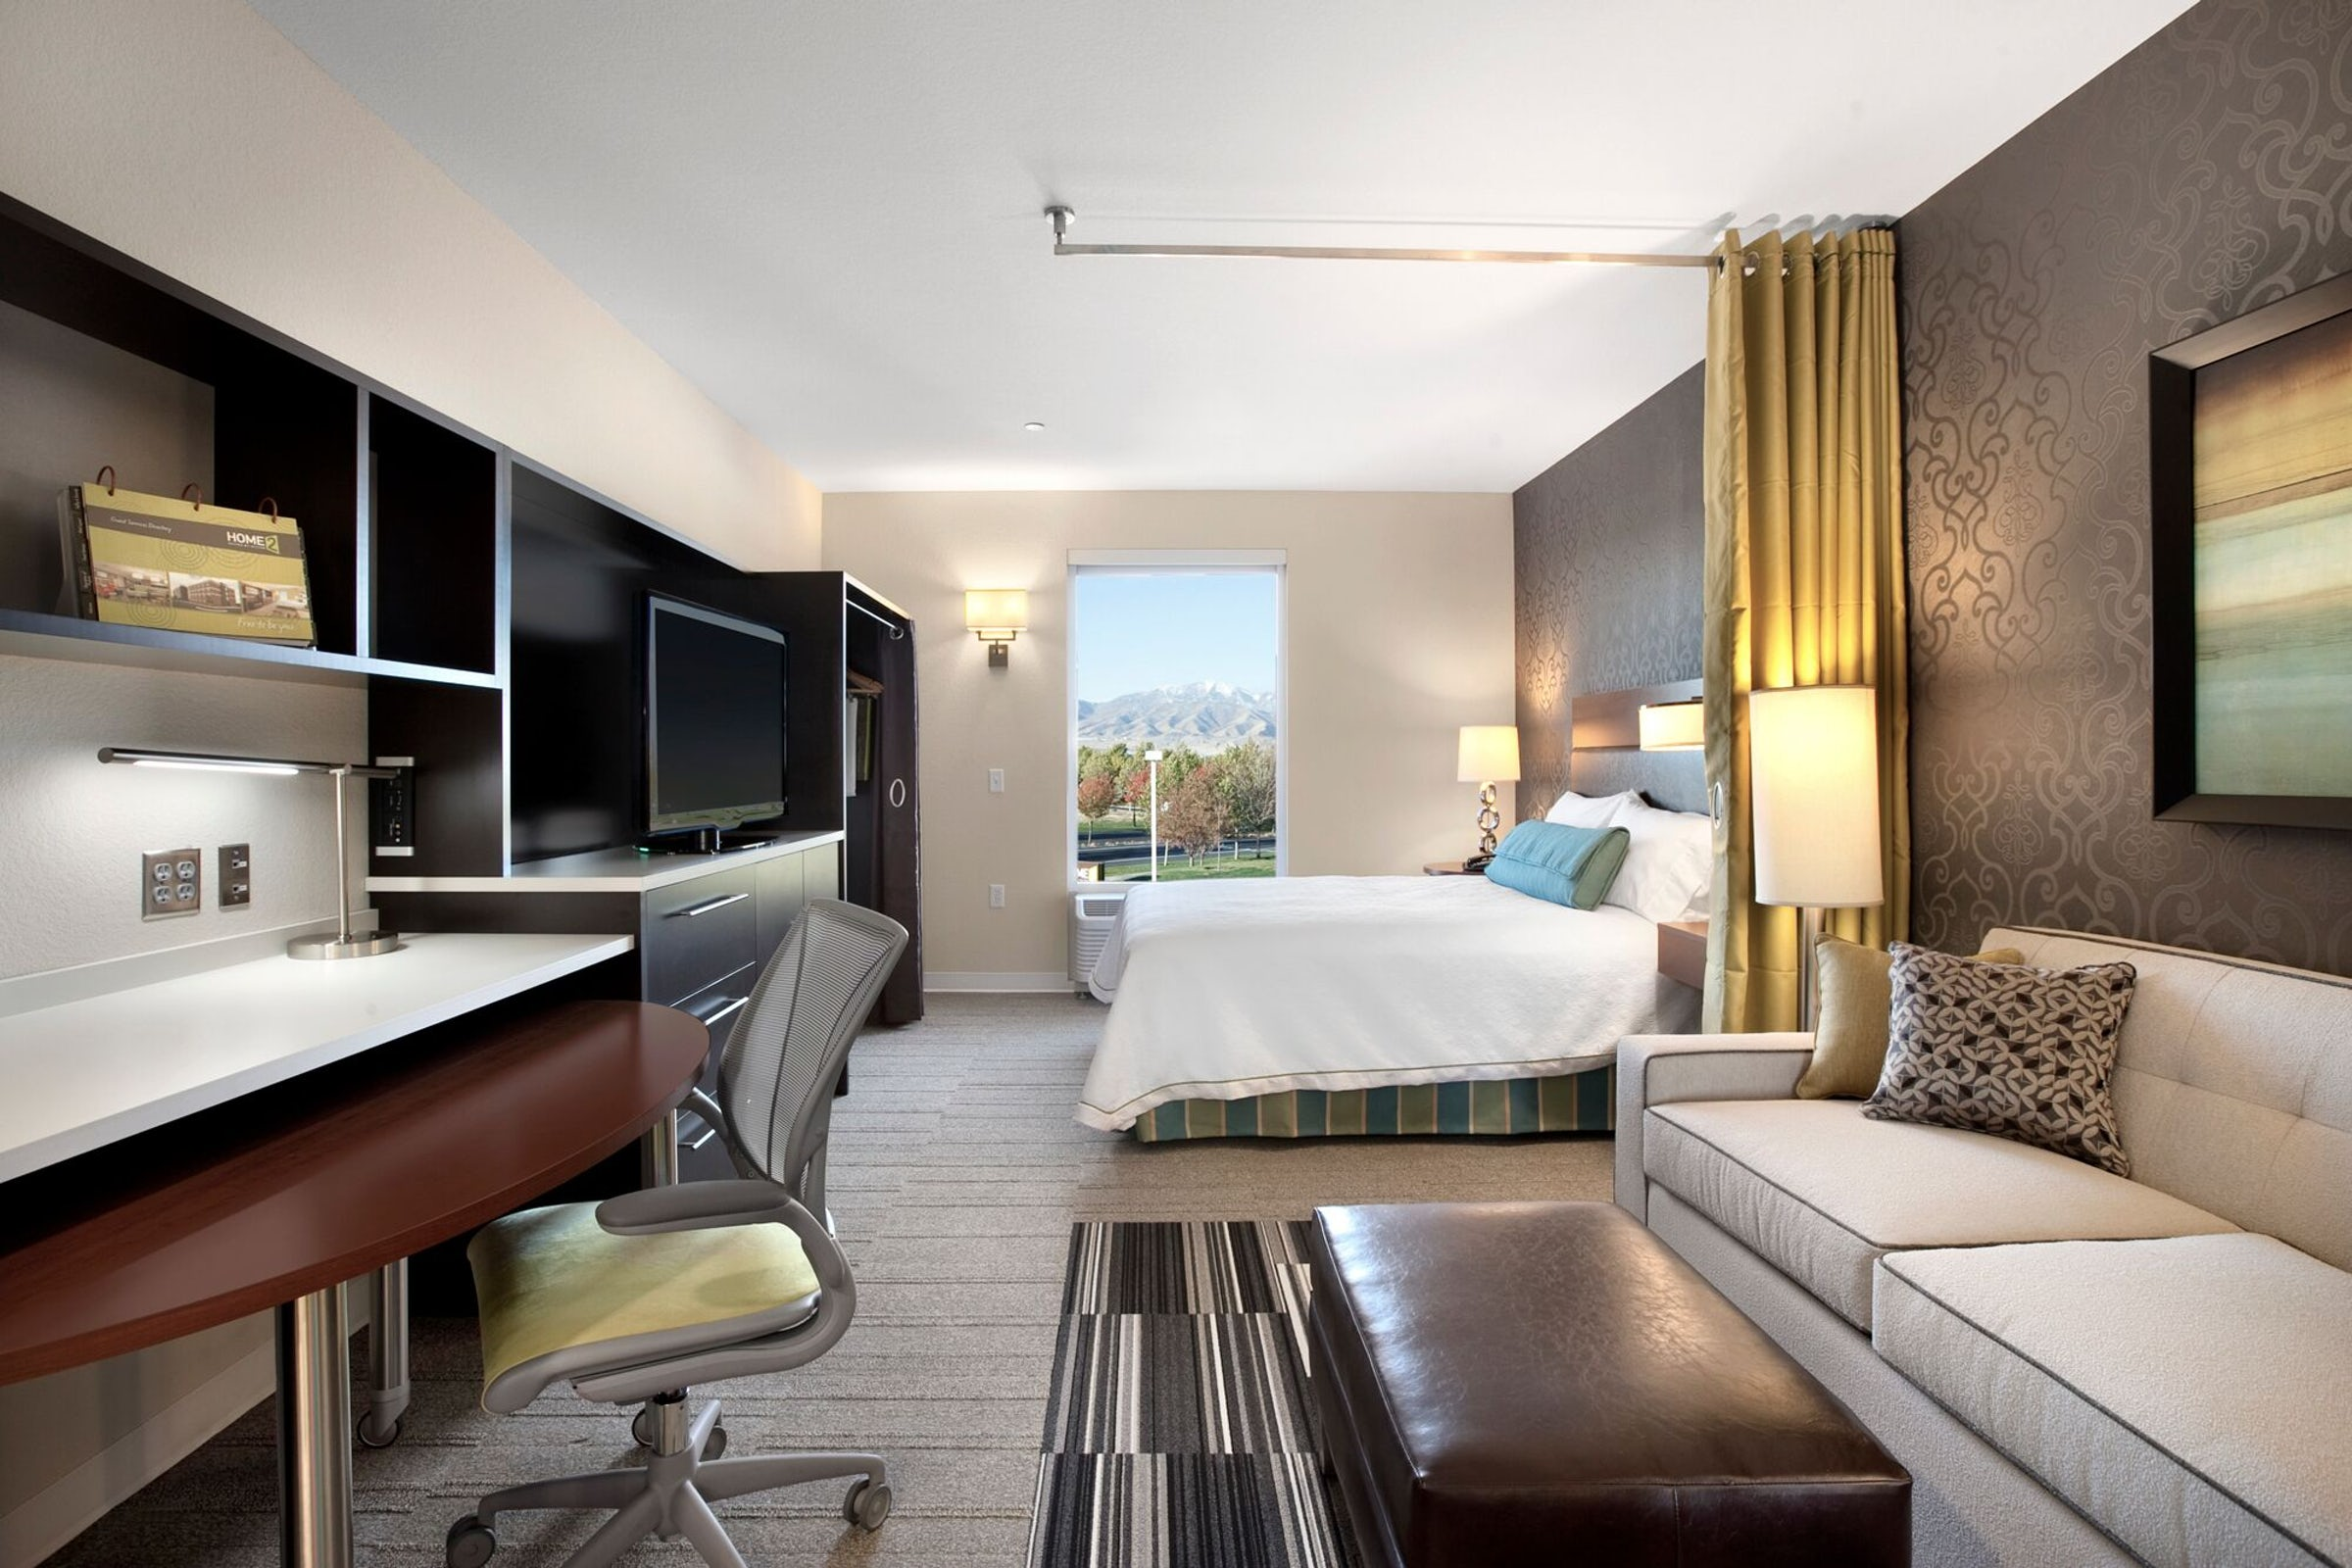 Home2 Suites by Hilton Dallas Northpark in Beyond Dallas